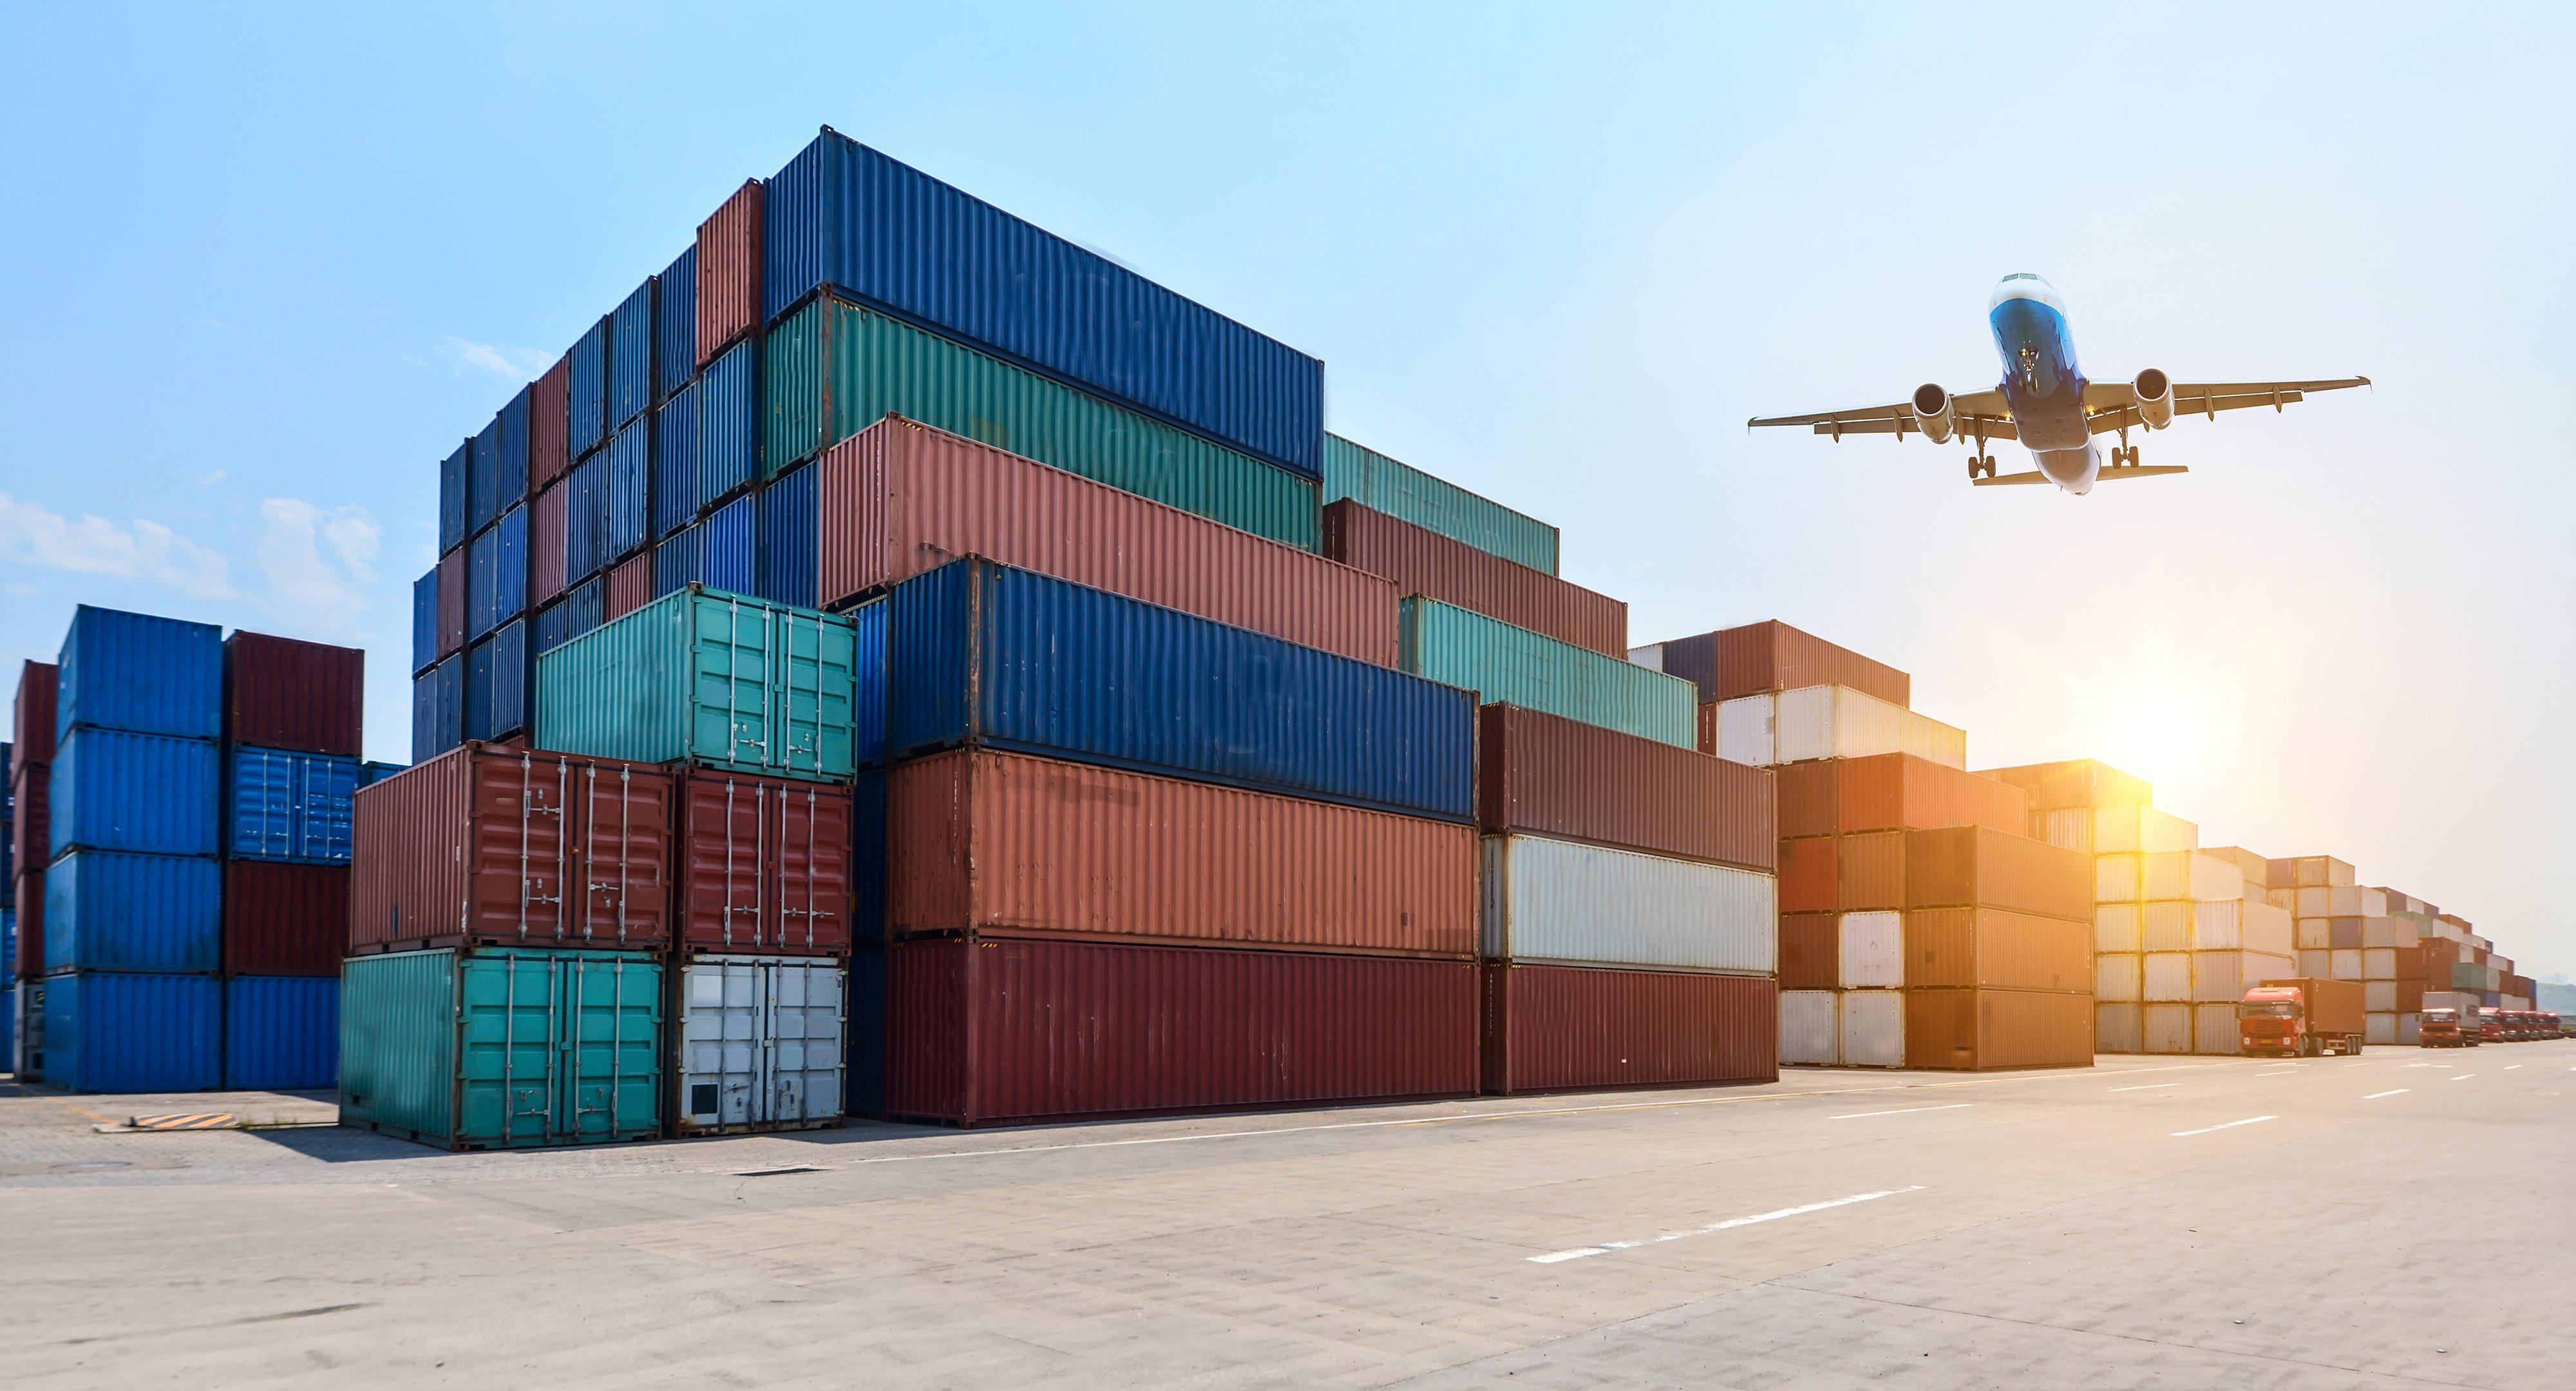 7 Blockchain Applications in Logistics